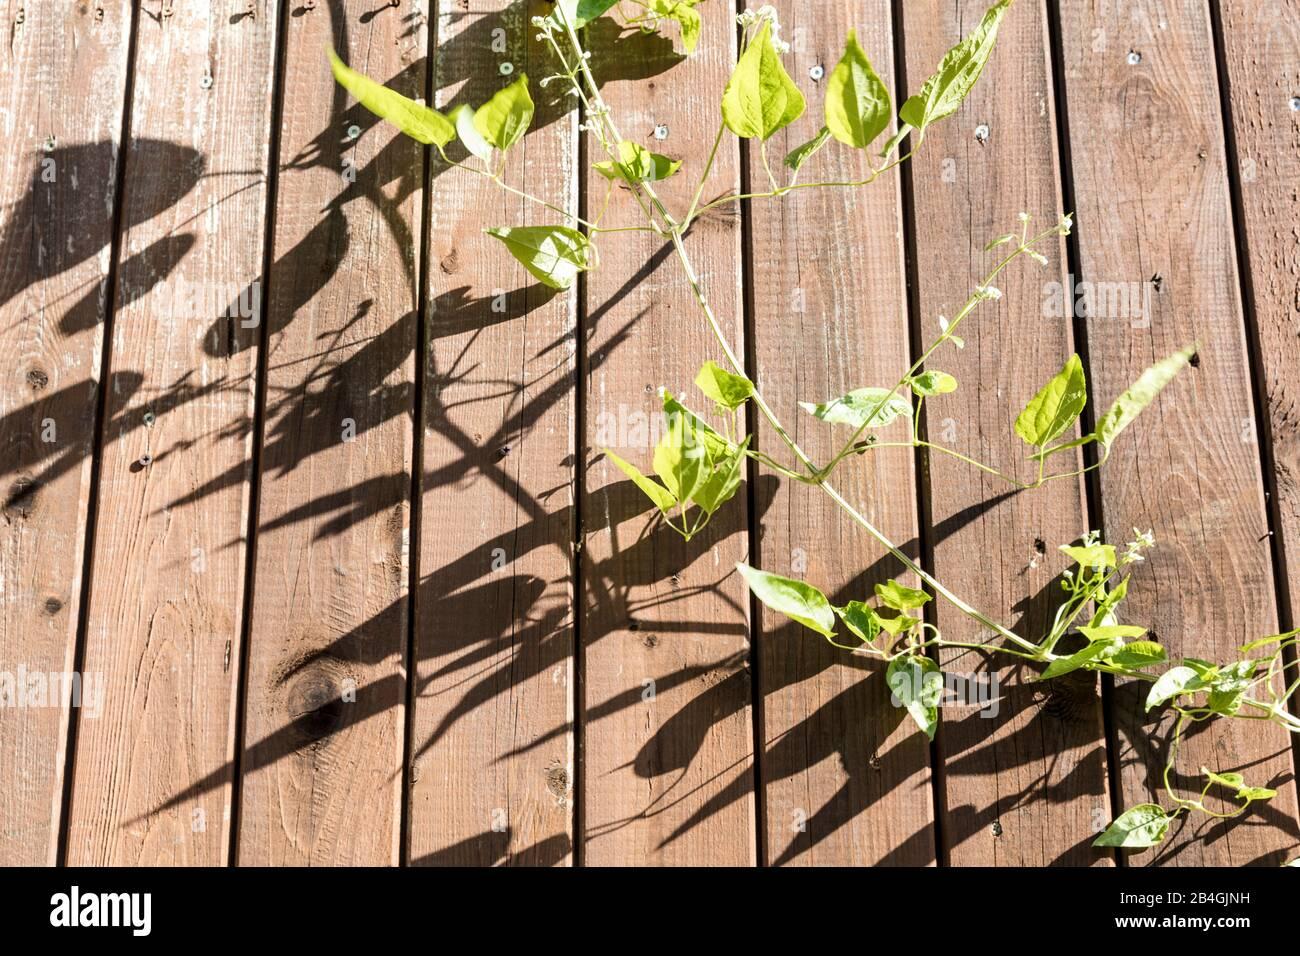 Leaves, tendrils, wooden wall, botany, plant, Wolfenbüttel, Lower Saxony, Germany, Europe Stock Photo